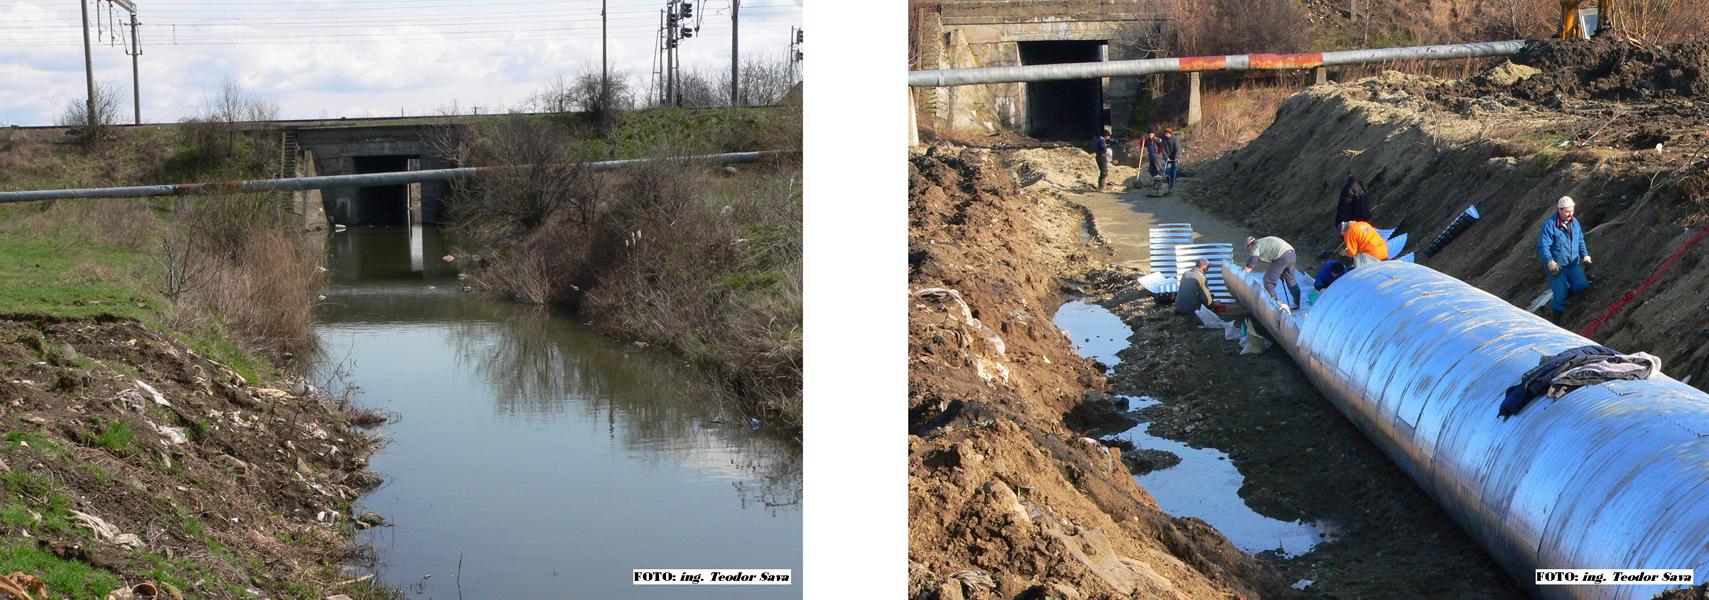 Structuri metalice prefabricate pentru drumuri si poduri TUBO TRADE PROIECT - Poza 4